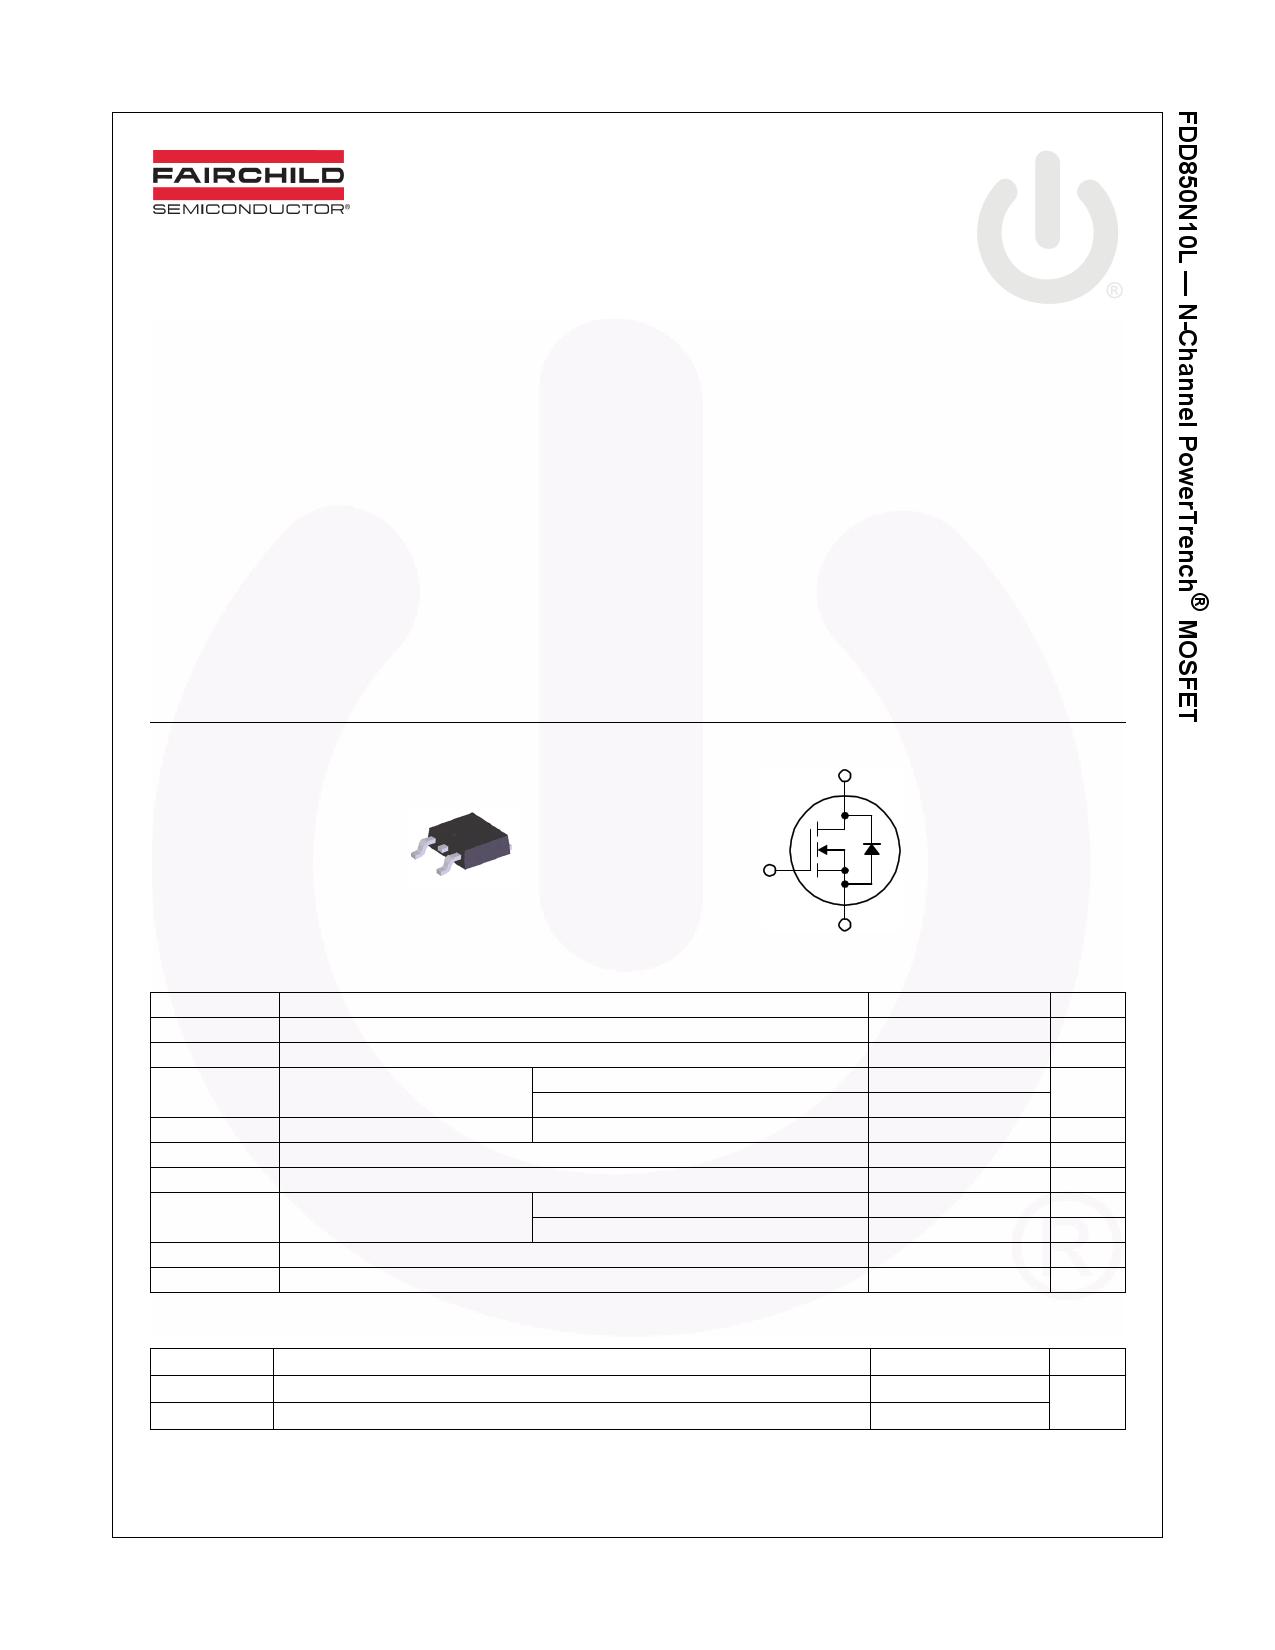 FDD850N10L 데이터시트 및 FDD850N10L PDF